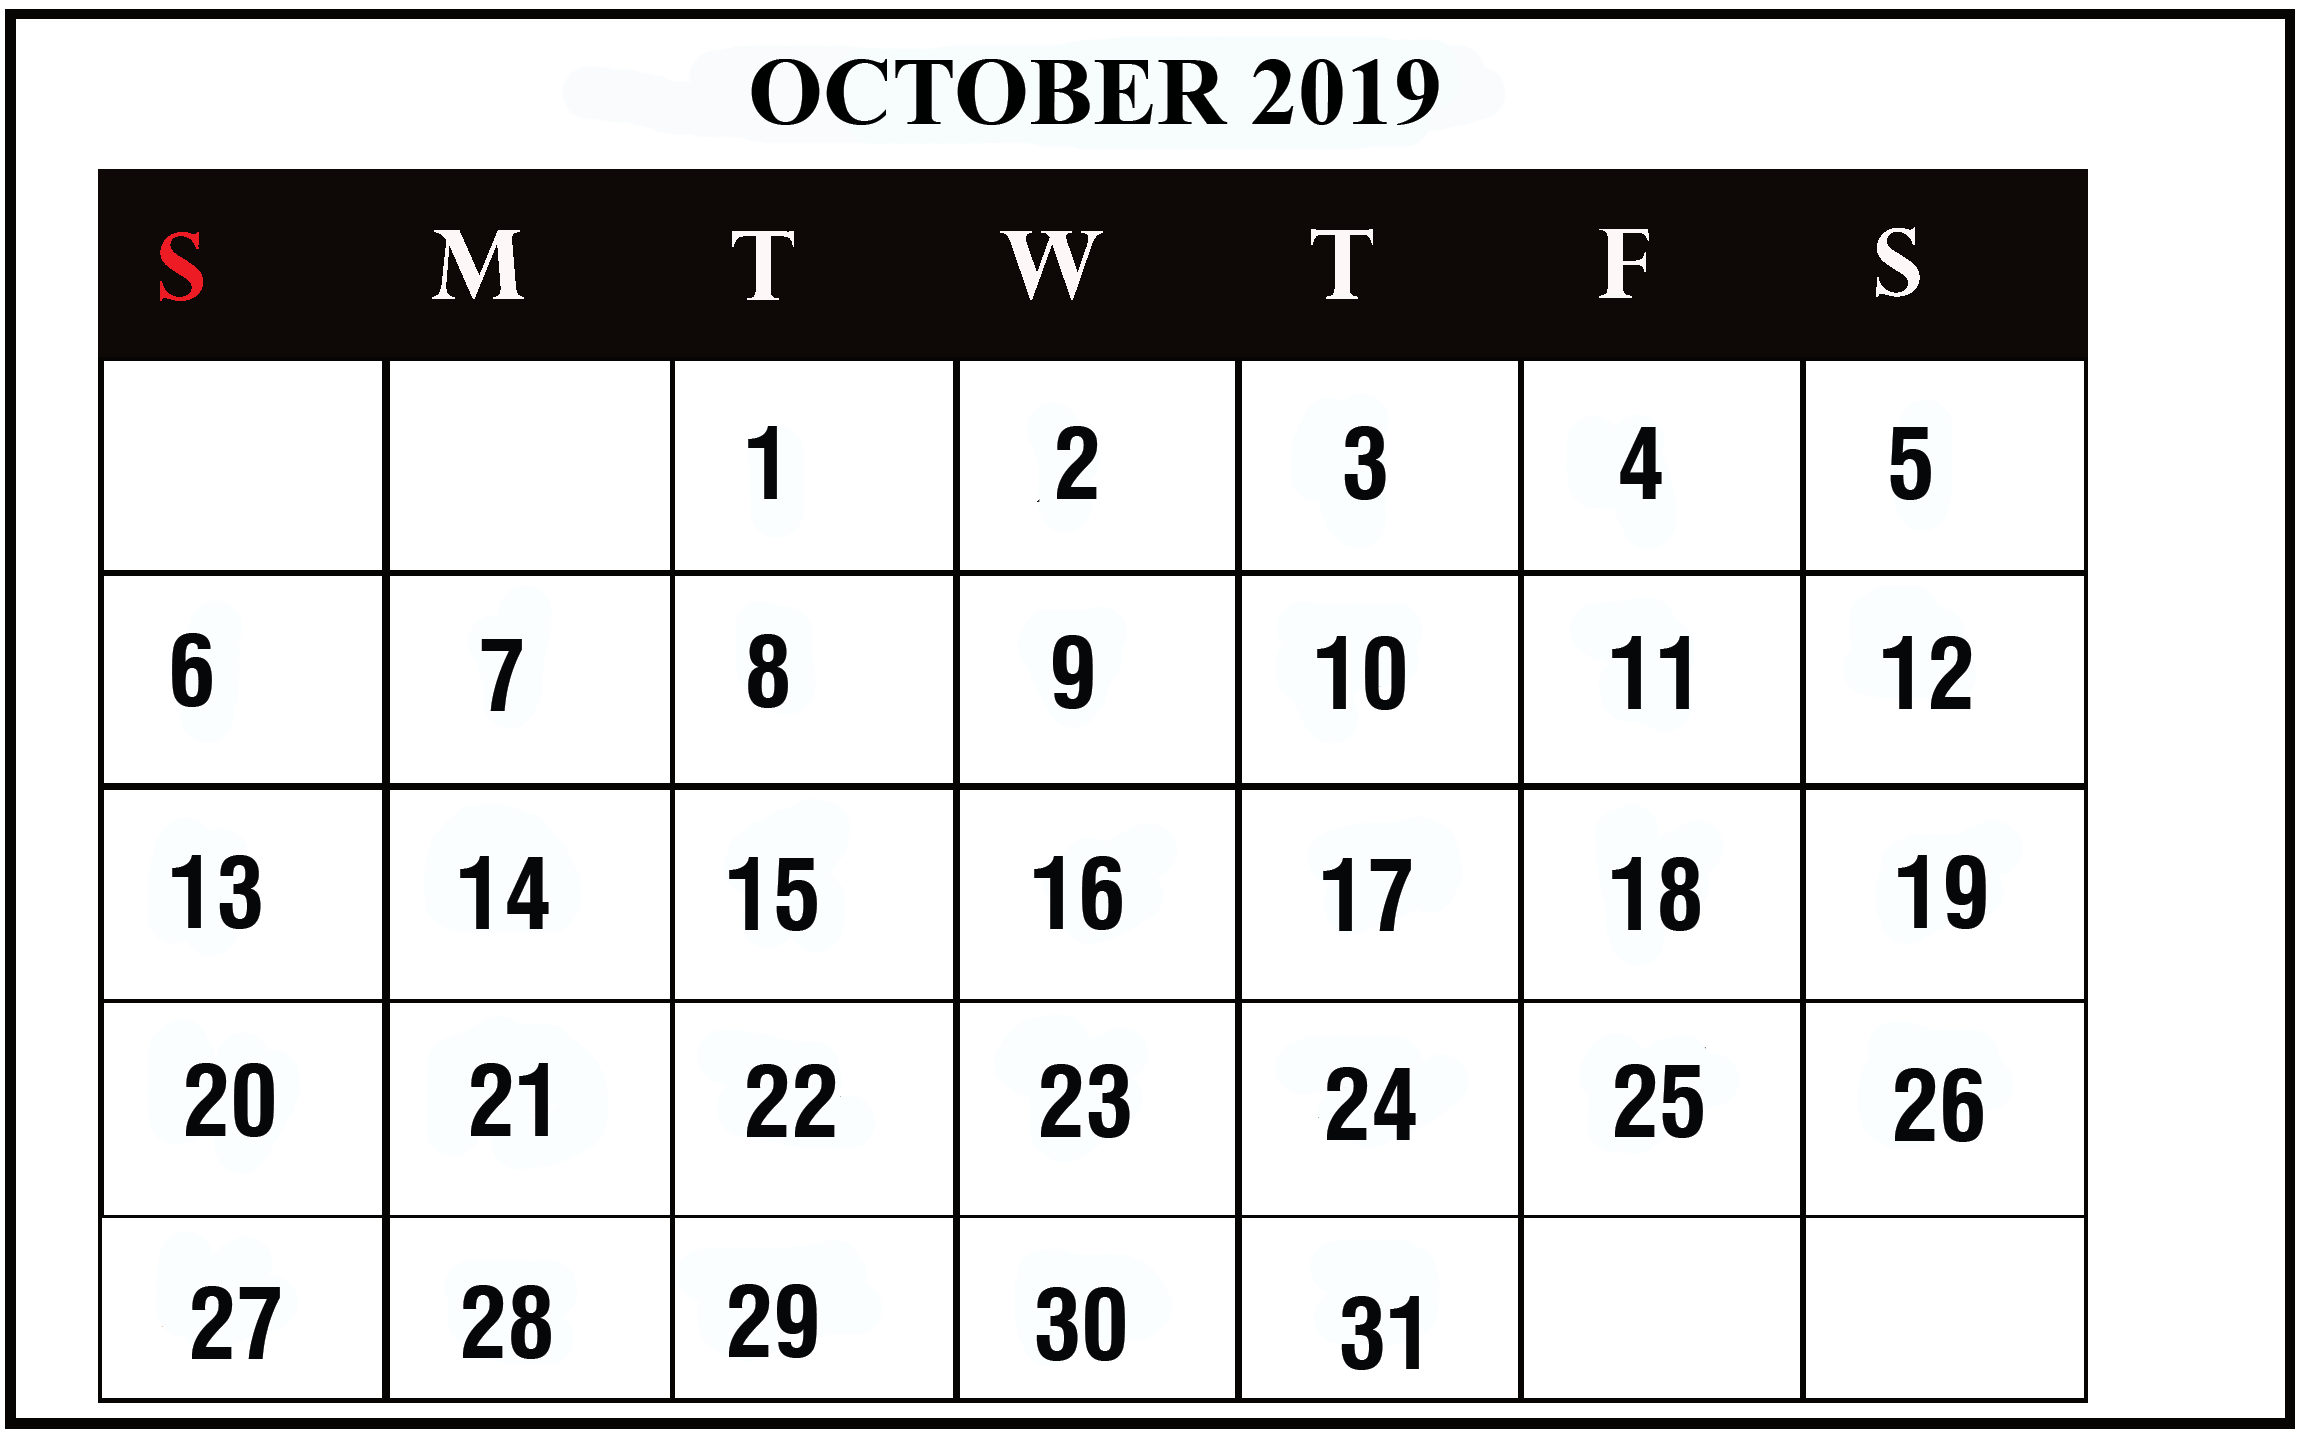 October Calendar 2019 Editable Template to Print